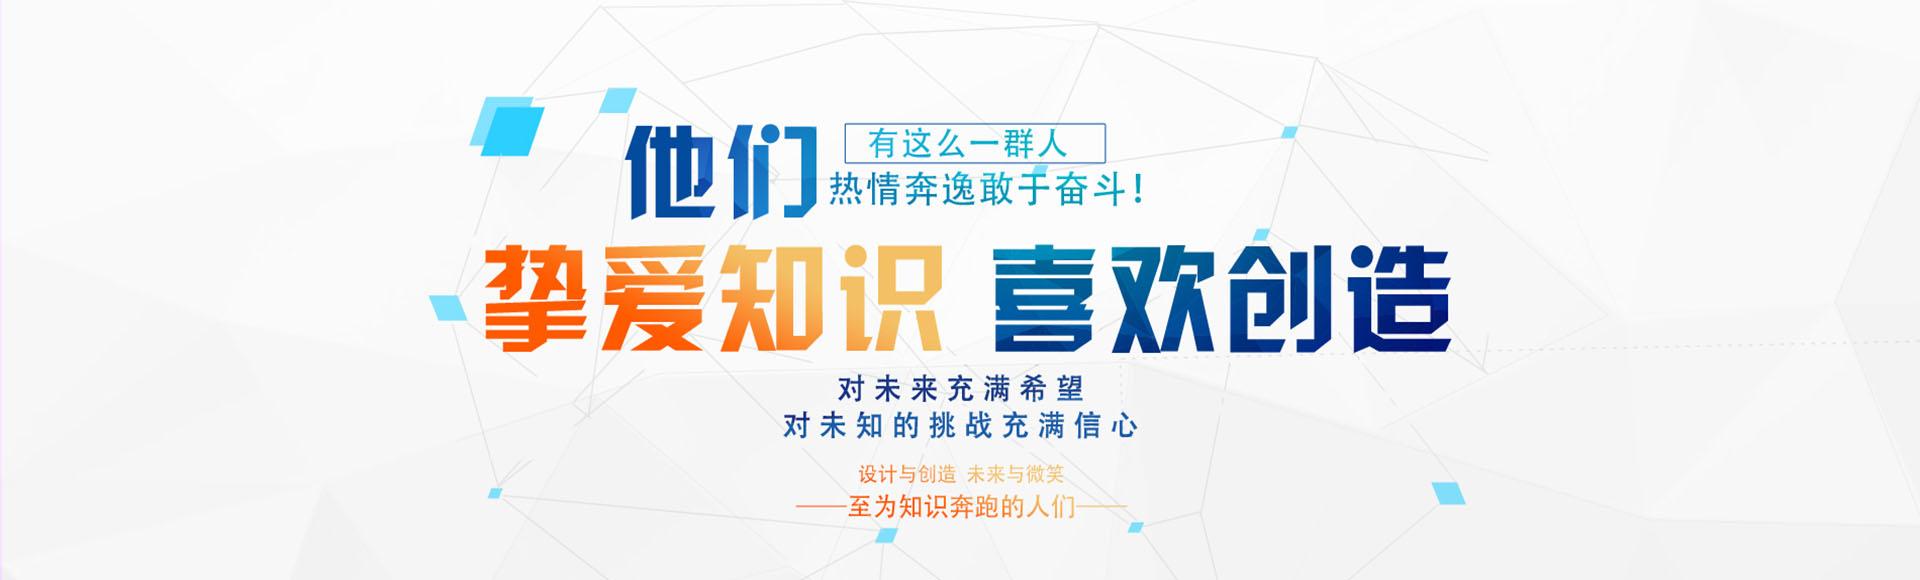 重庆主城区网络tuiguang